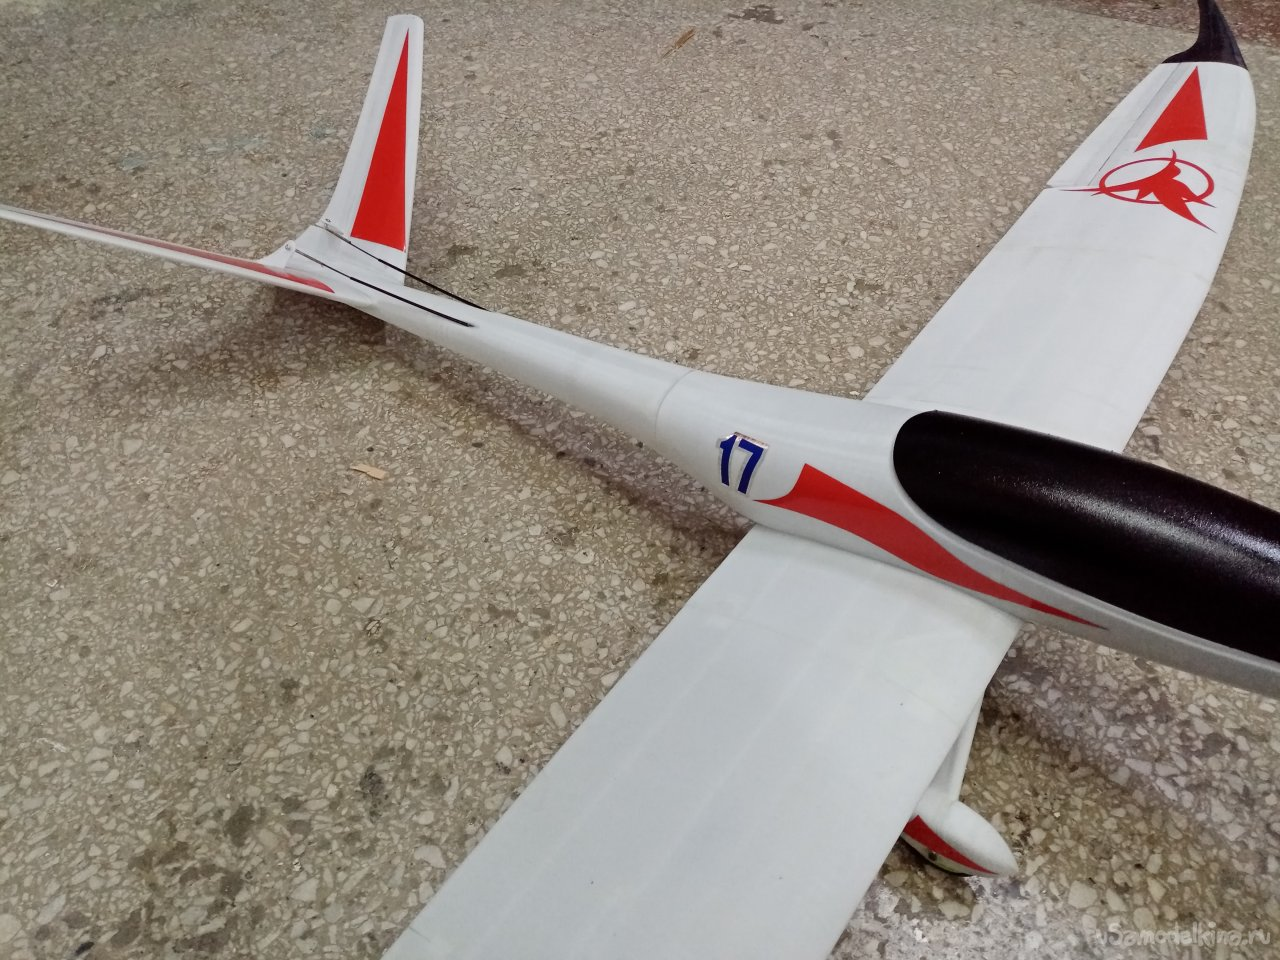 Airplane livery